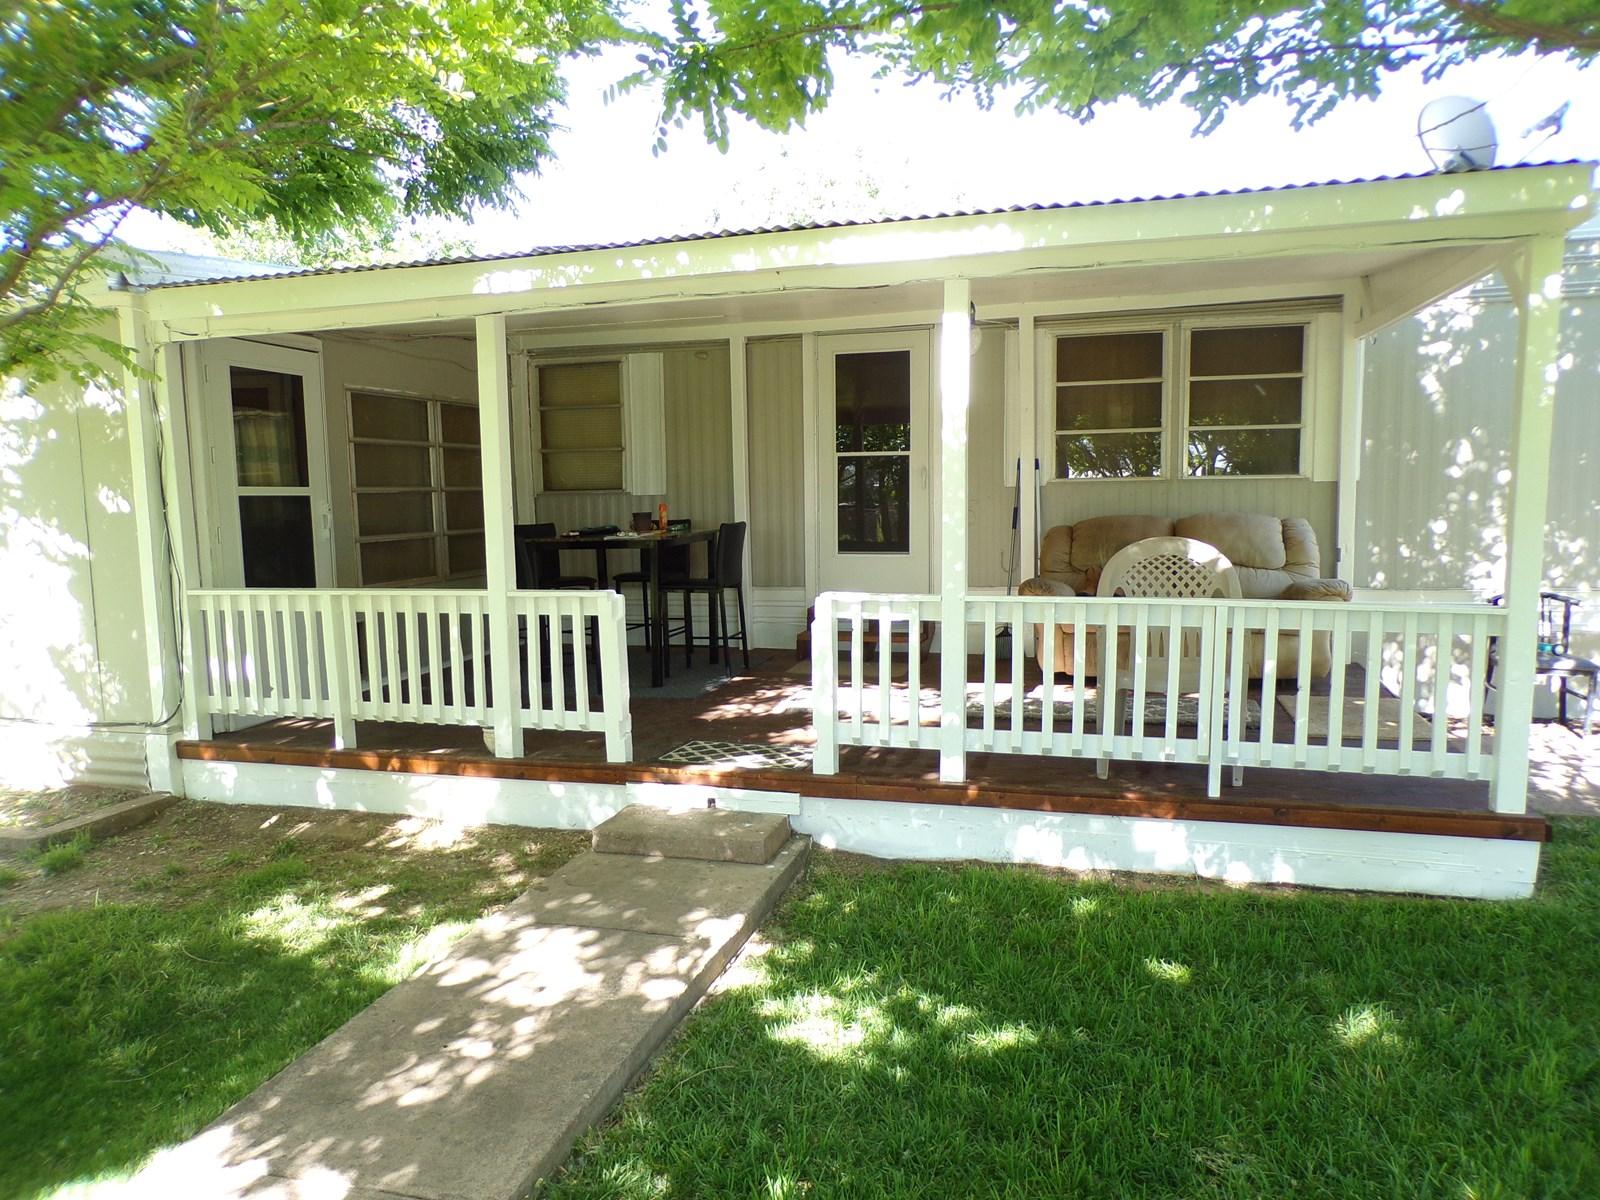 Home in Tularosa, NM